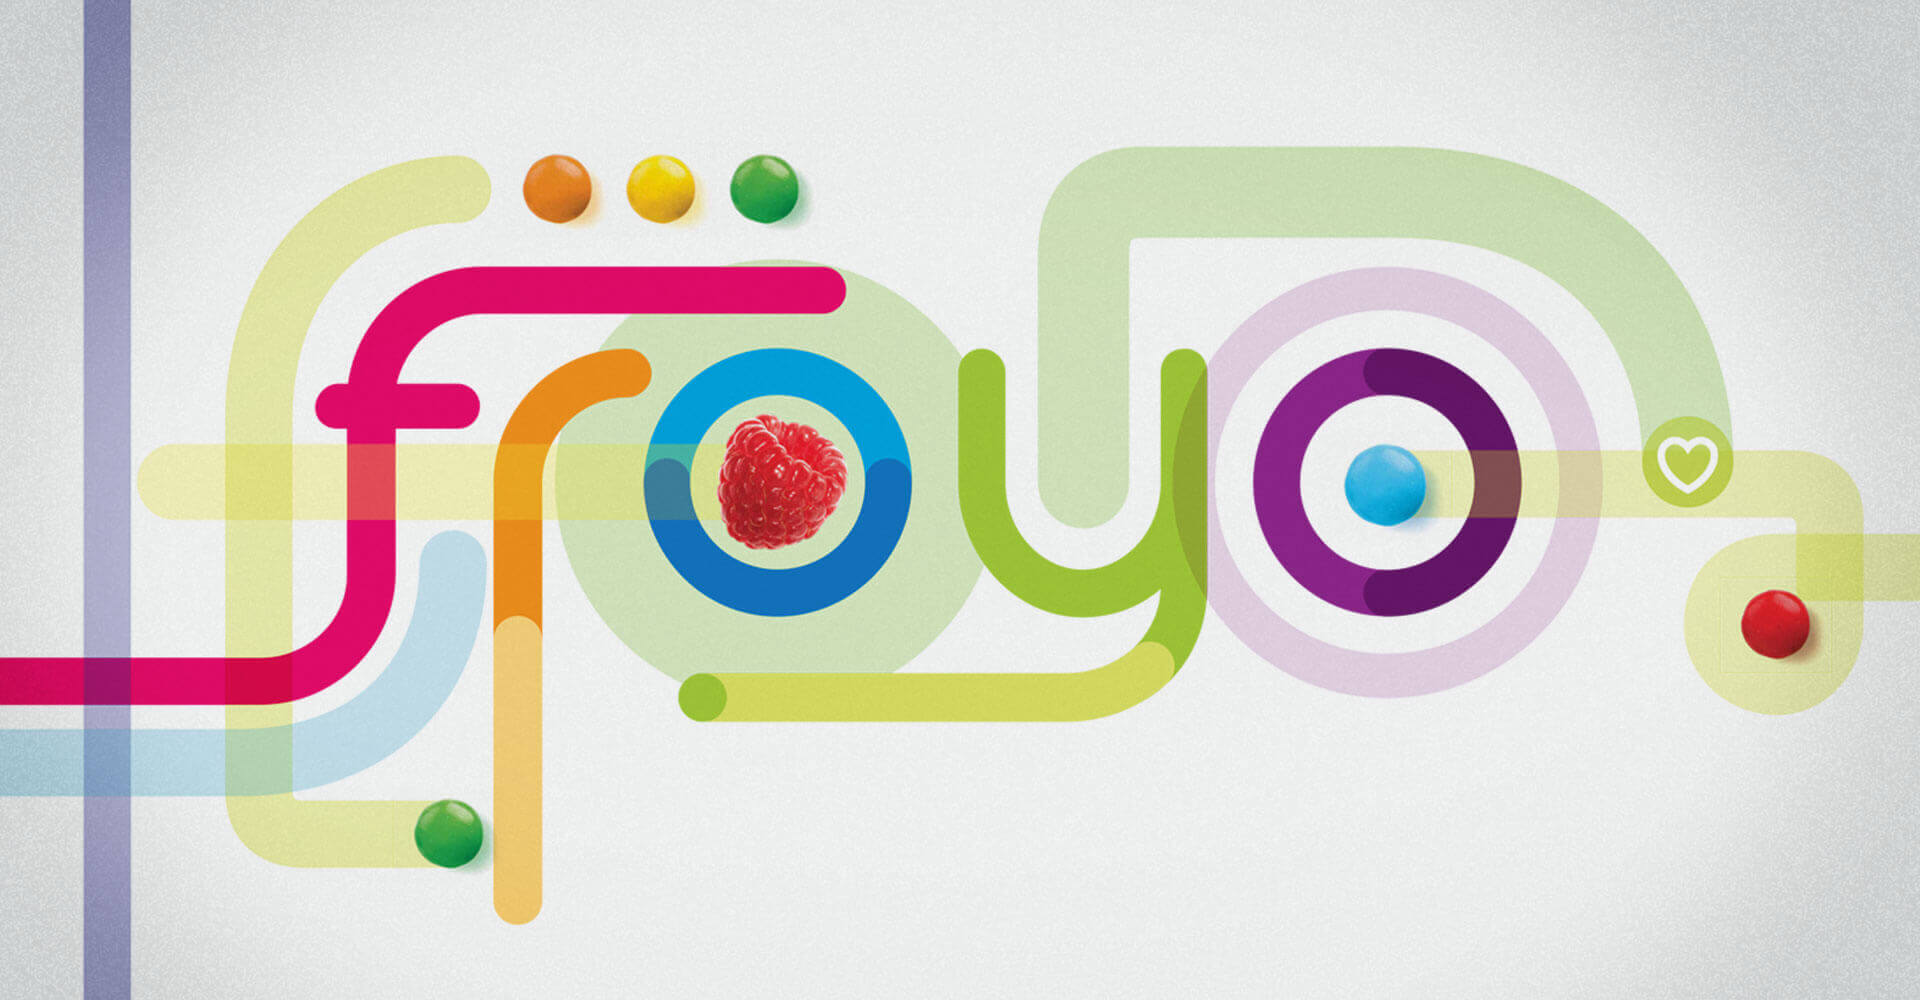 Yogurty's